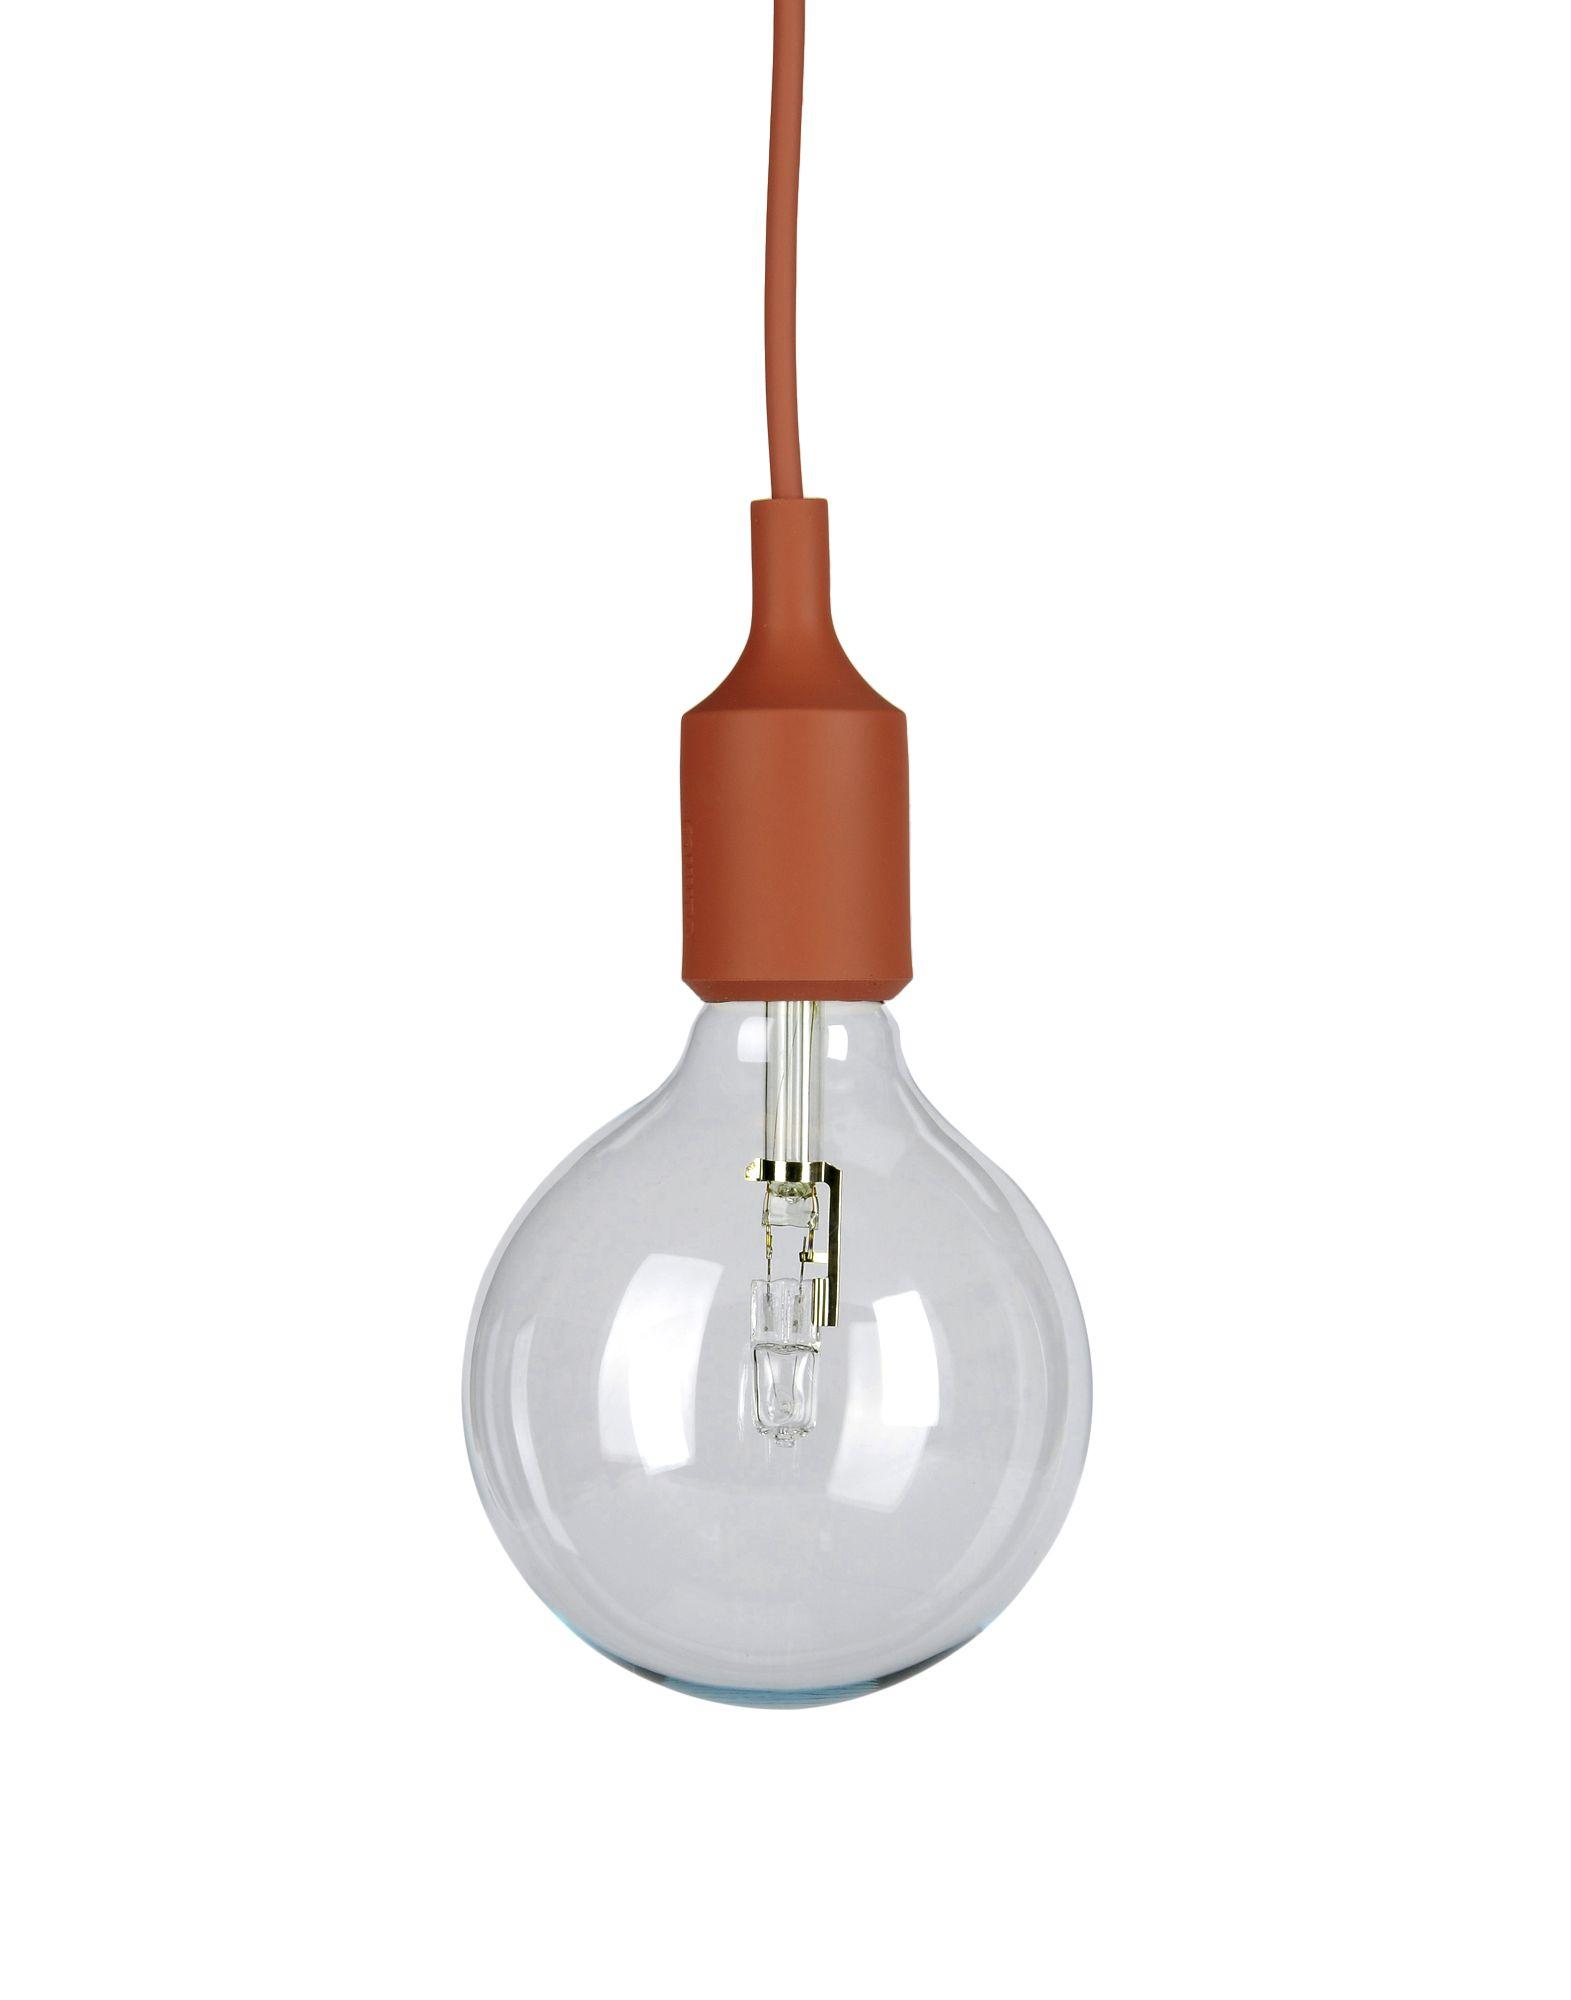 MUUTO Подвесная лампа modern fashion creative k9 crystal wifi design led 9w wall lamp for living room bedroom aisle corridor bathroom 80 265v 2063